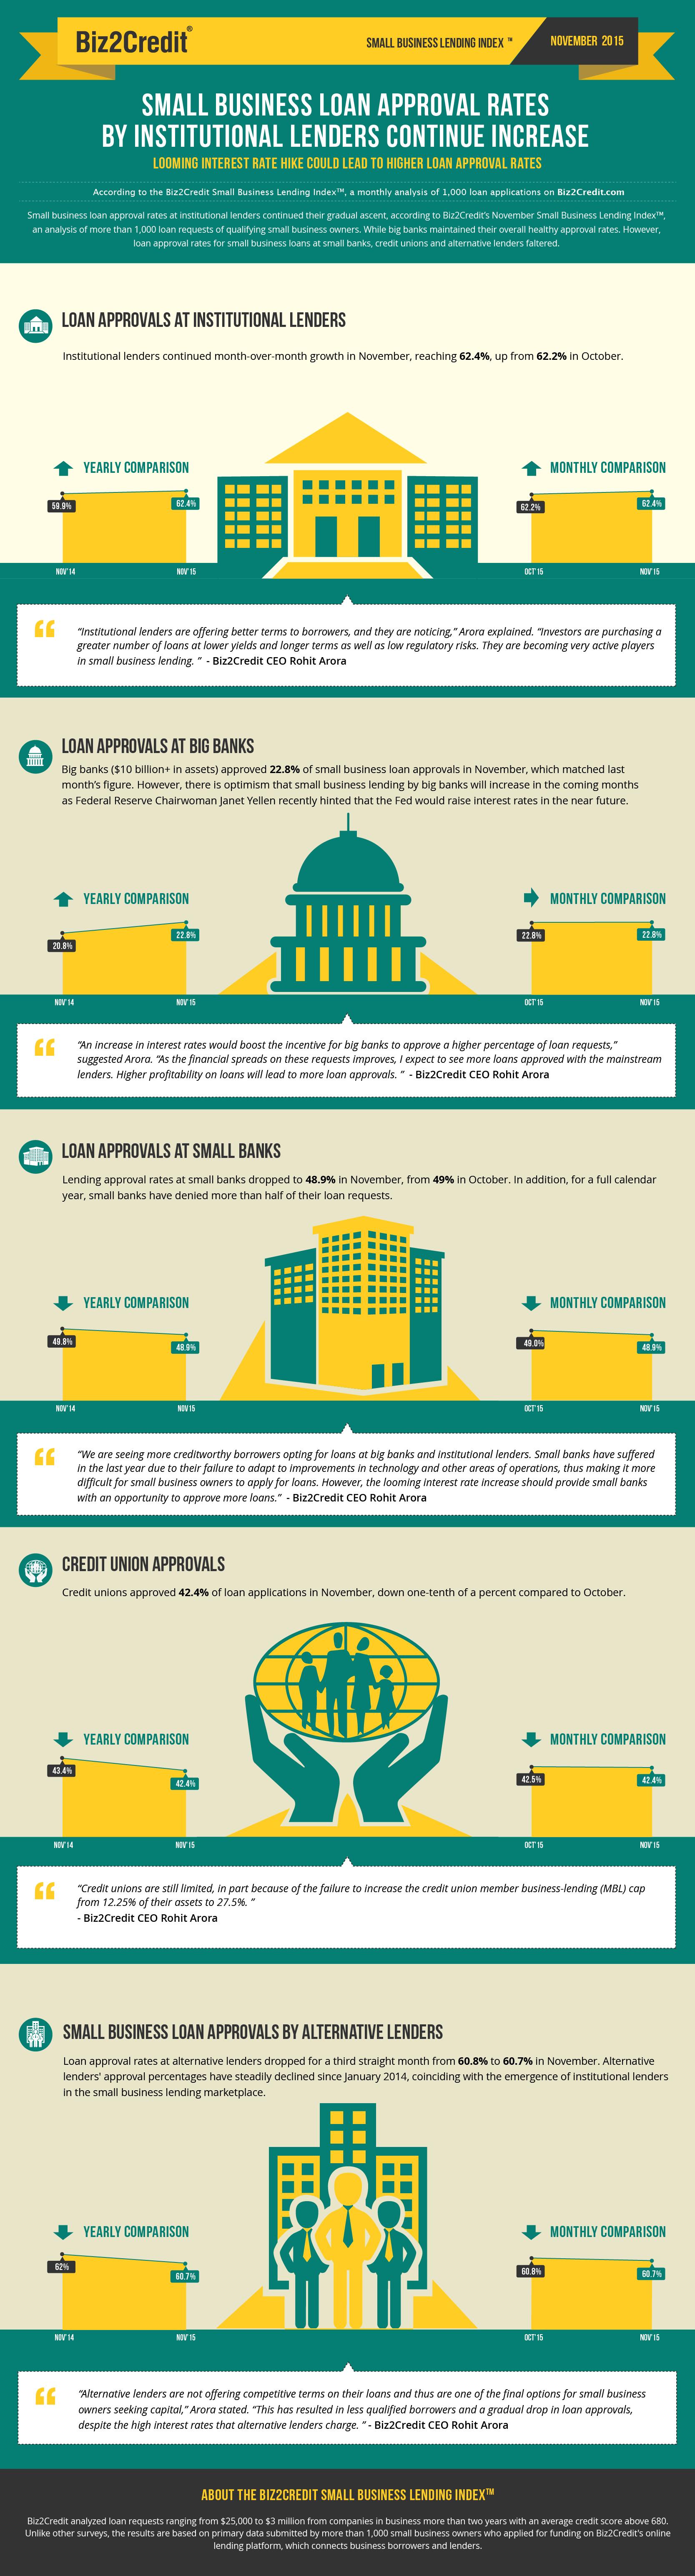 Nov 15 Lending Index Infographic